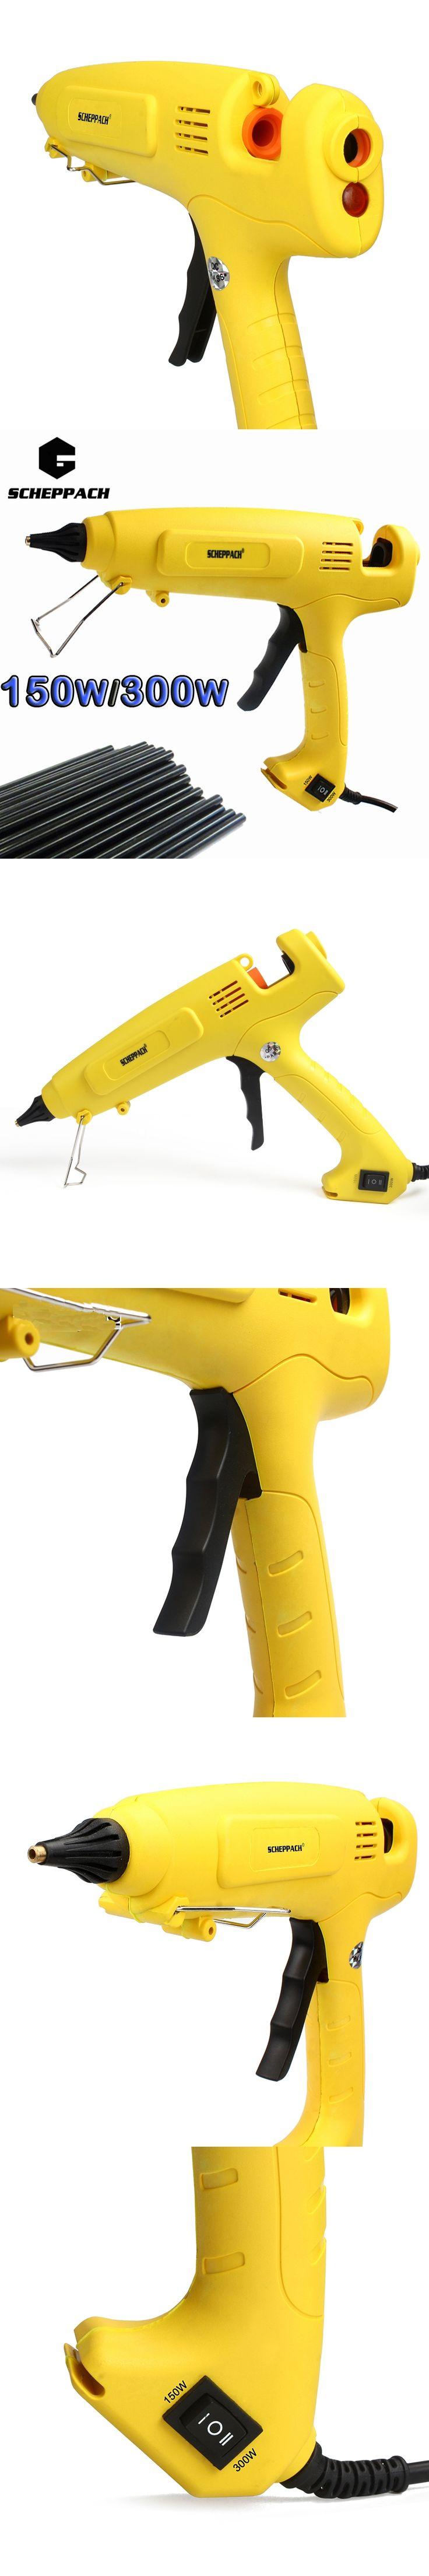 Crazy Power 150W/300W Hot Melt Glue Gun EU Plug Adjustable Professional Copper Nozzle  Heater Heating Wax 11mm Glue stick